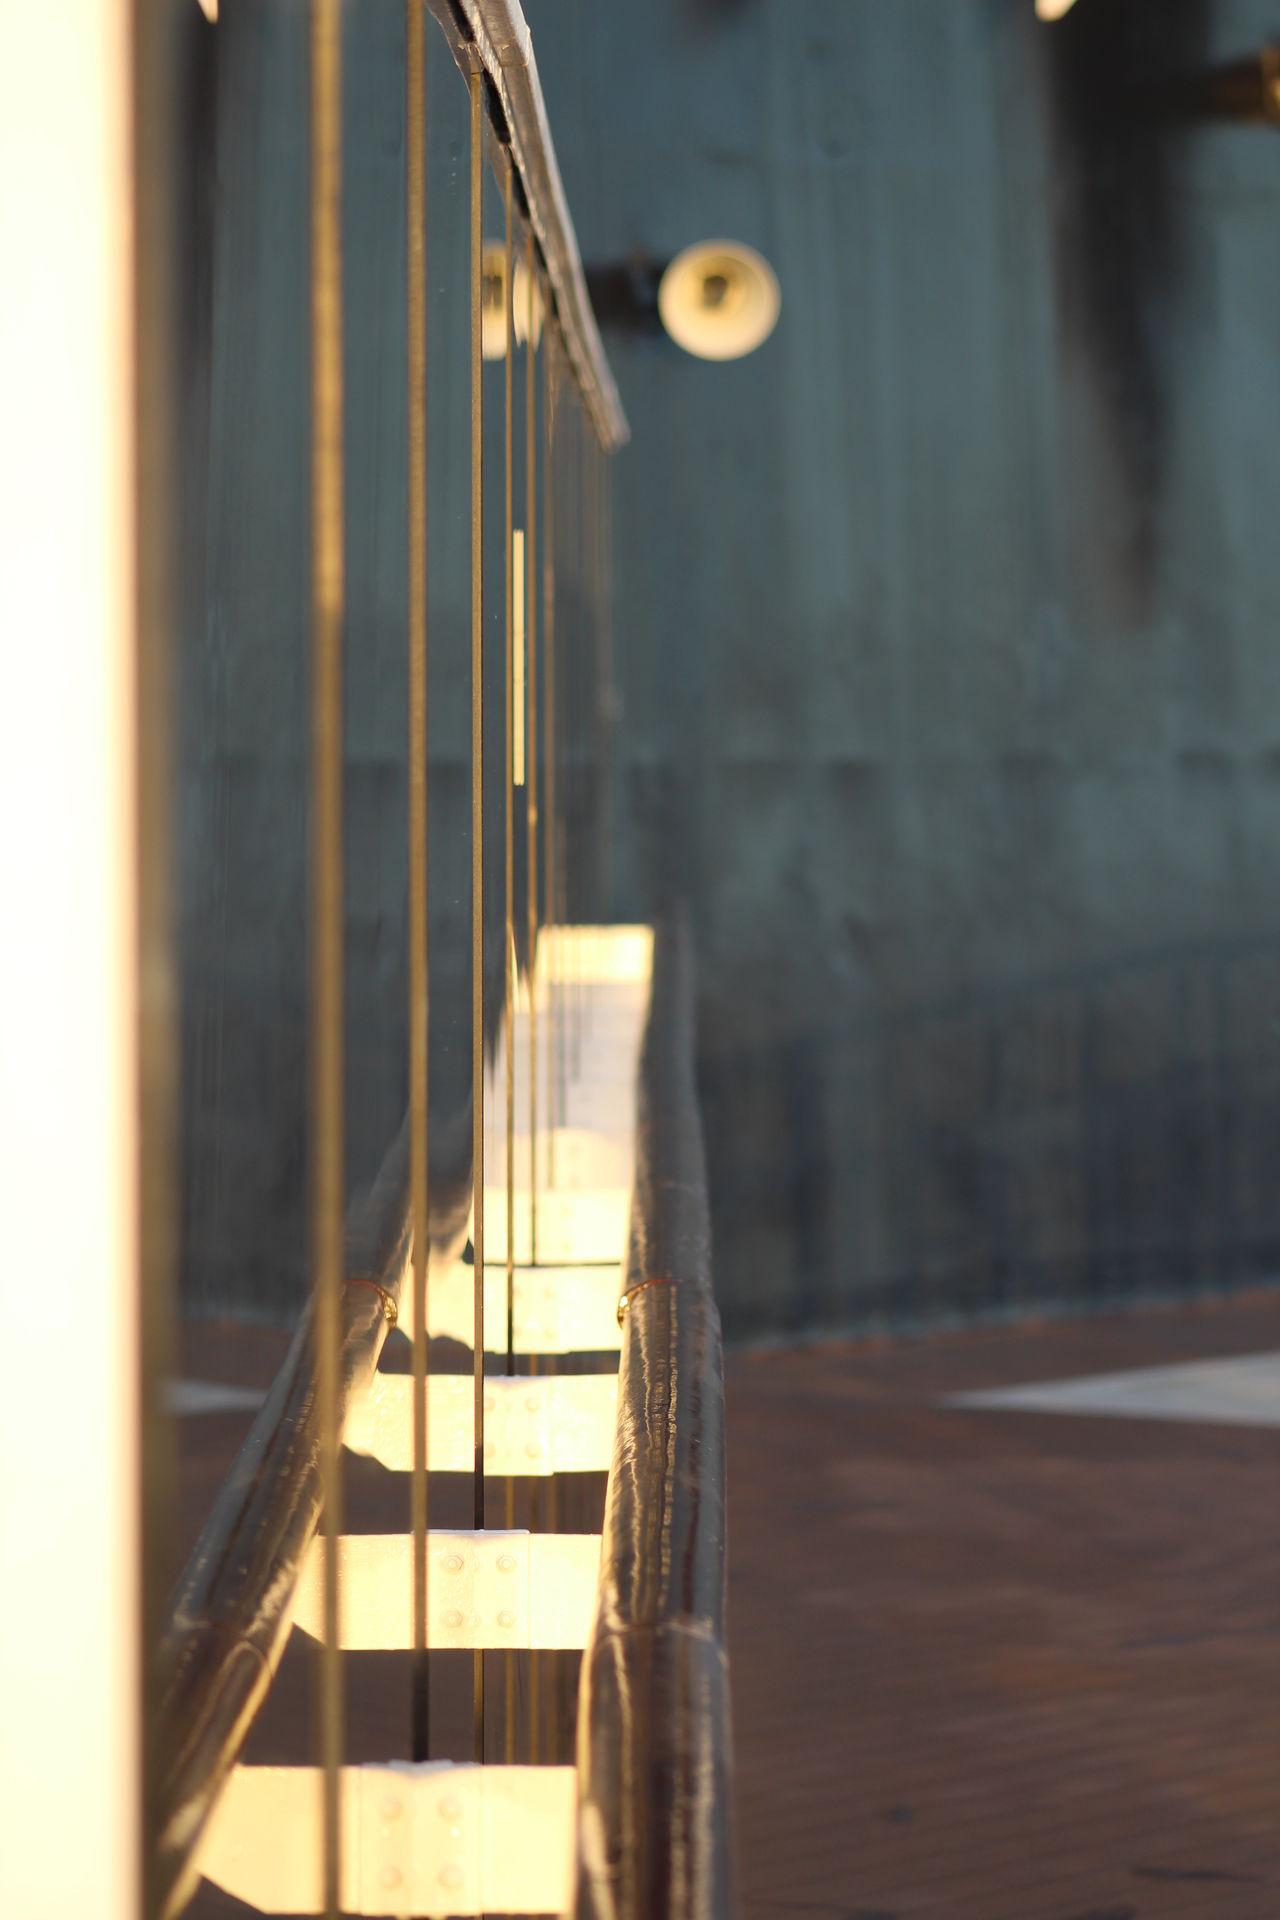 Cruise Cruise Ship Glass Gold Holiday Mirror Mirror Reflection Msc Msc Sinfonia Ocean Railing Reflection Sinfonia Travel Wooden Railing